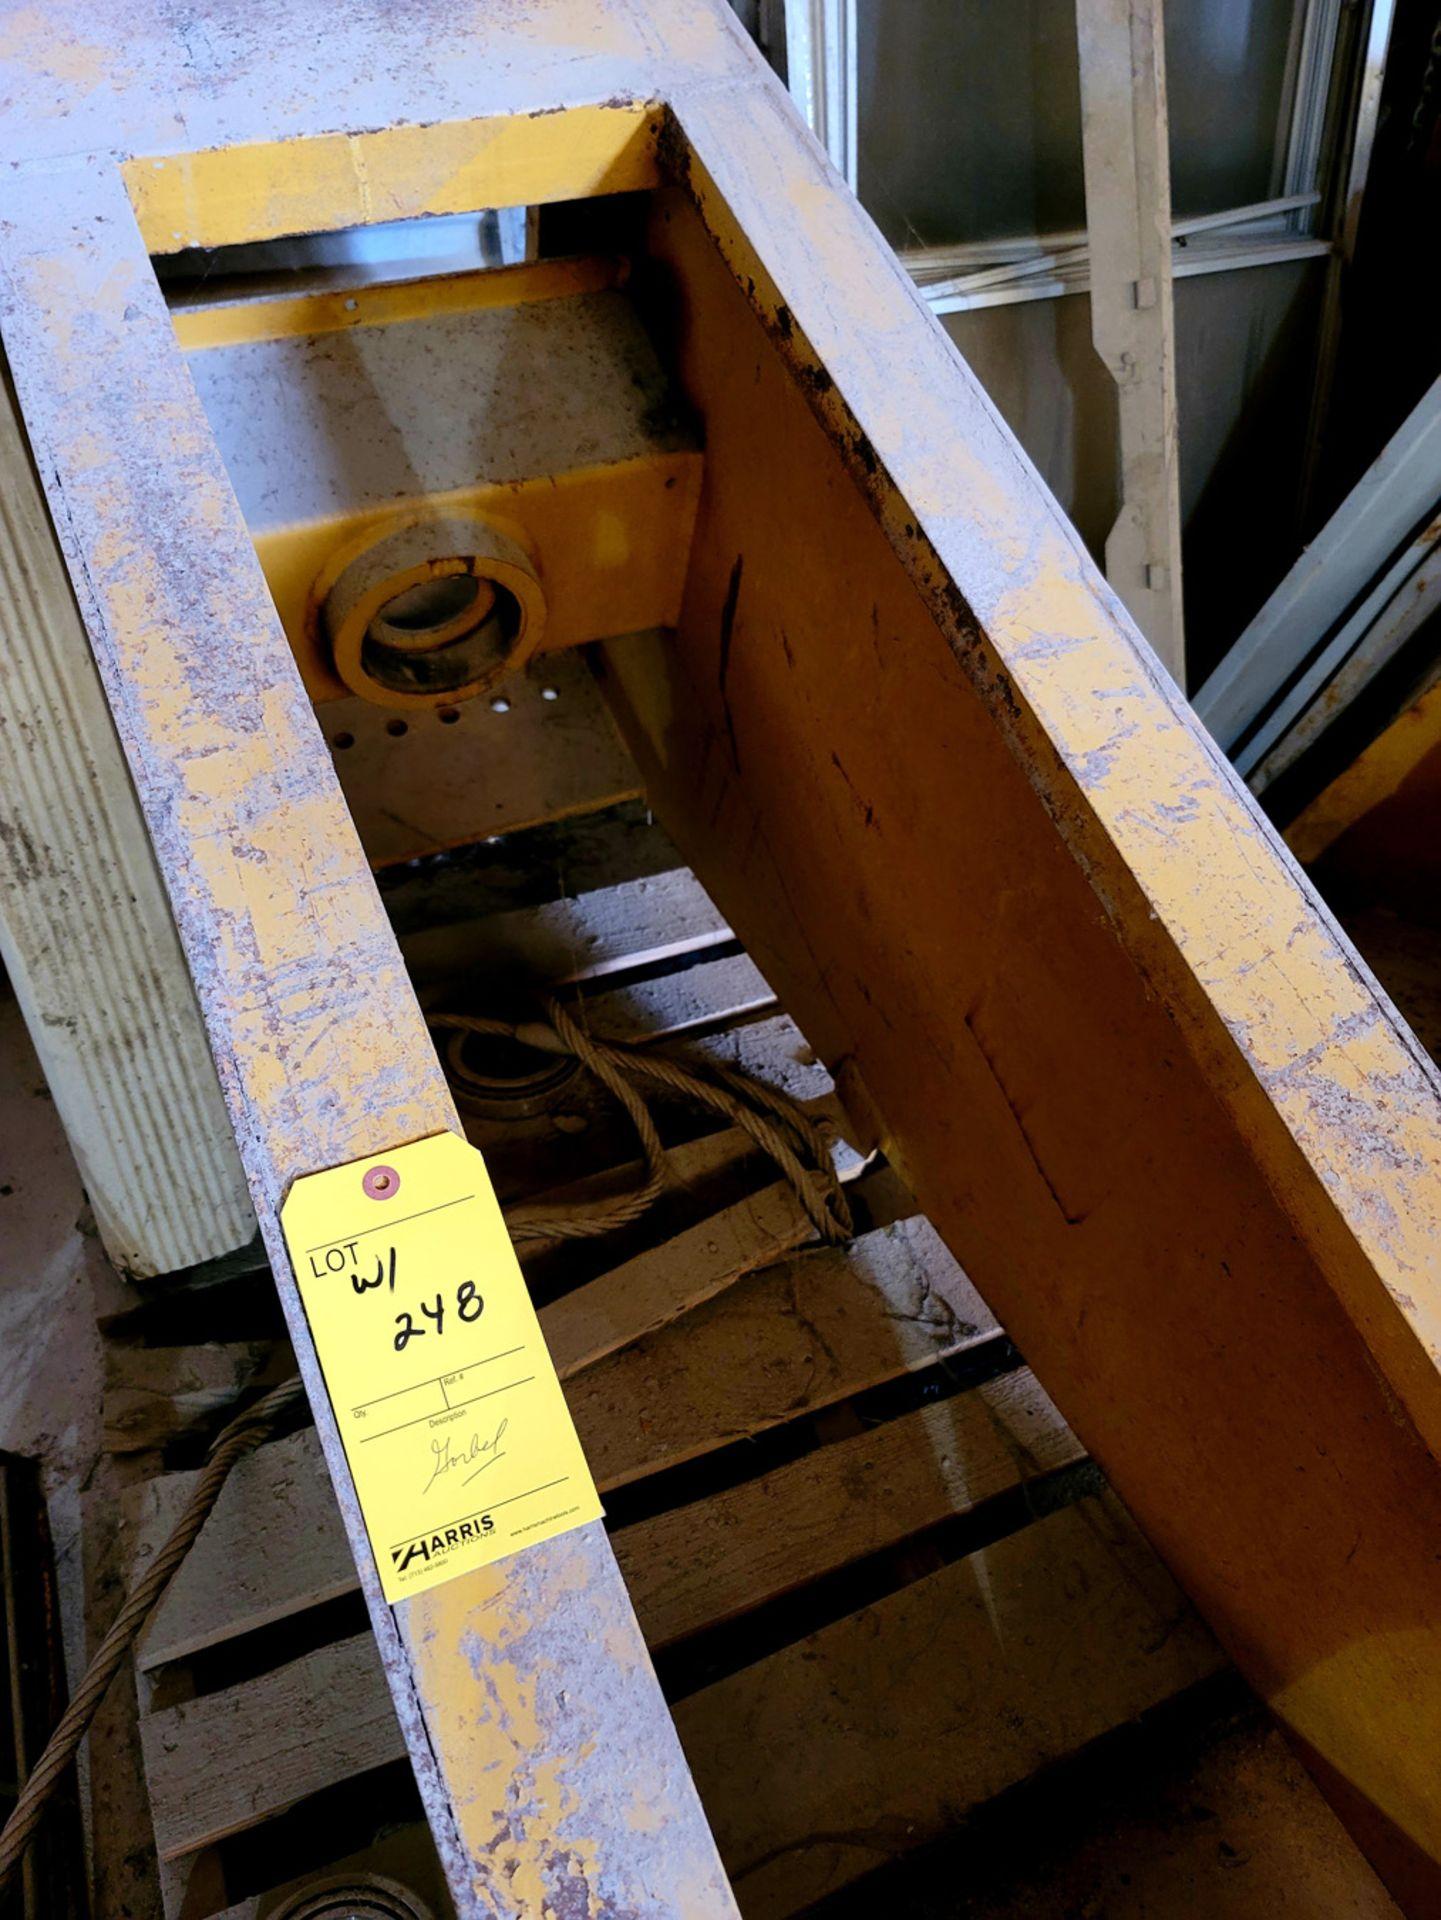 Gorbel 2 Ton Jib Crane with 2 Ton Lodestar CM Hoist - Image 7 of 7